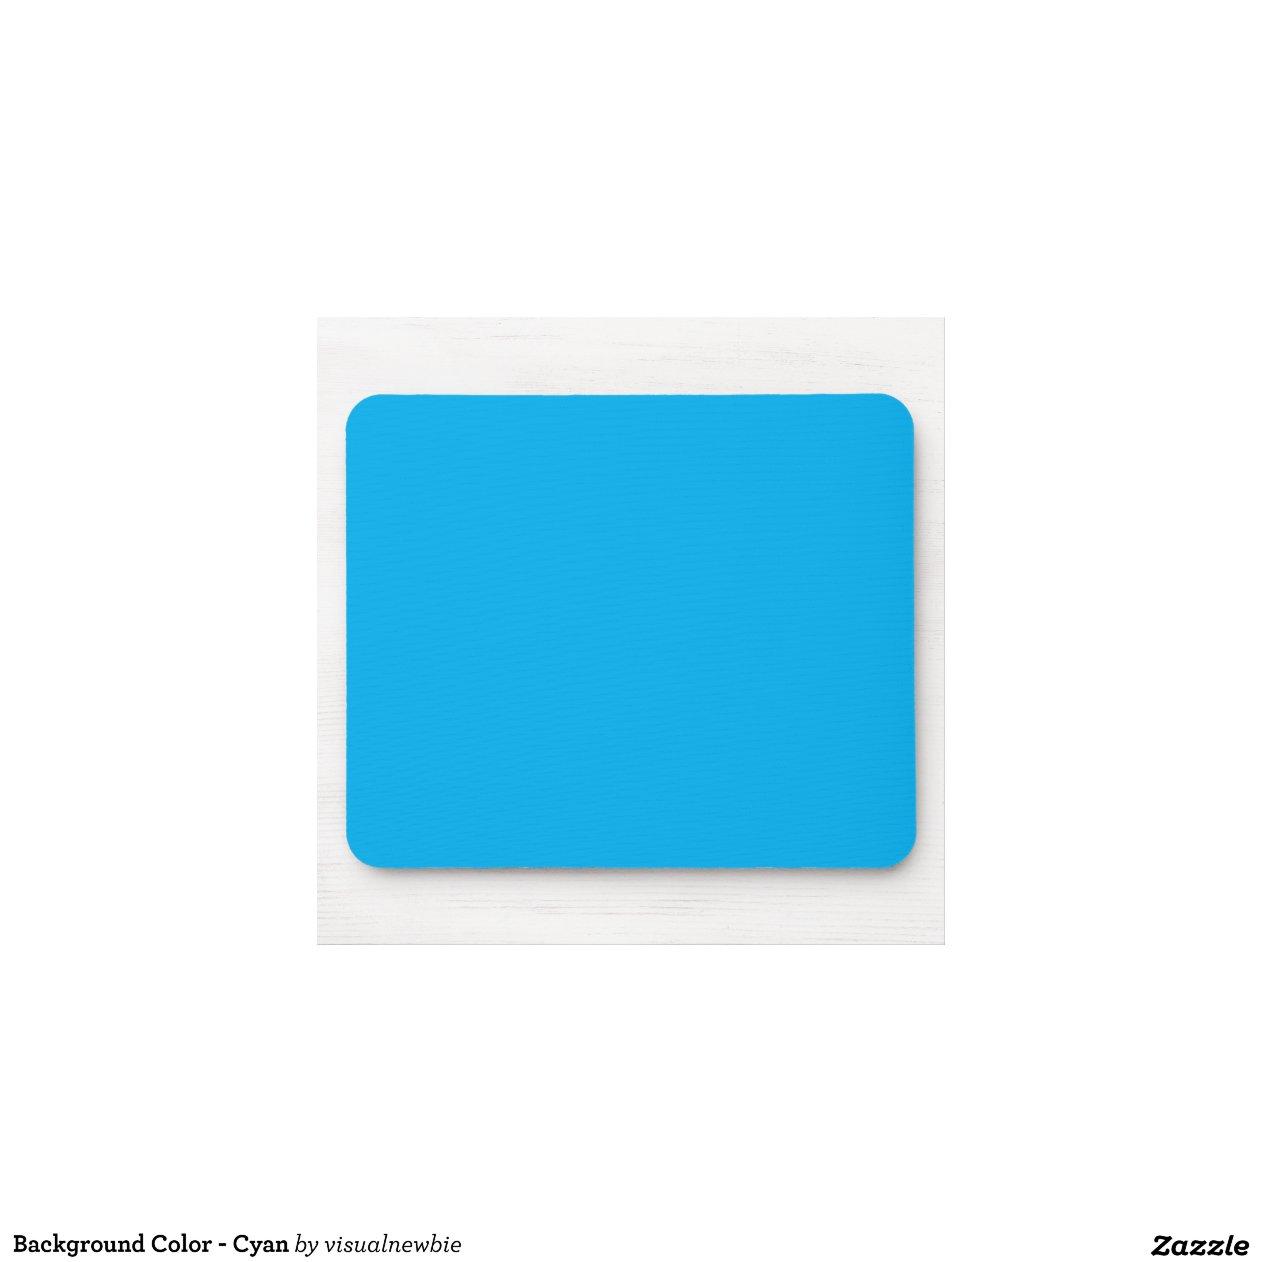 hintergrund farbe cyan blau mauspads zazzle. Black Bedroom Furniture Sets. Home Design Ideas